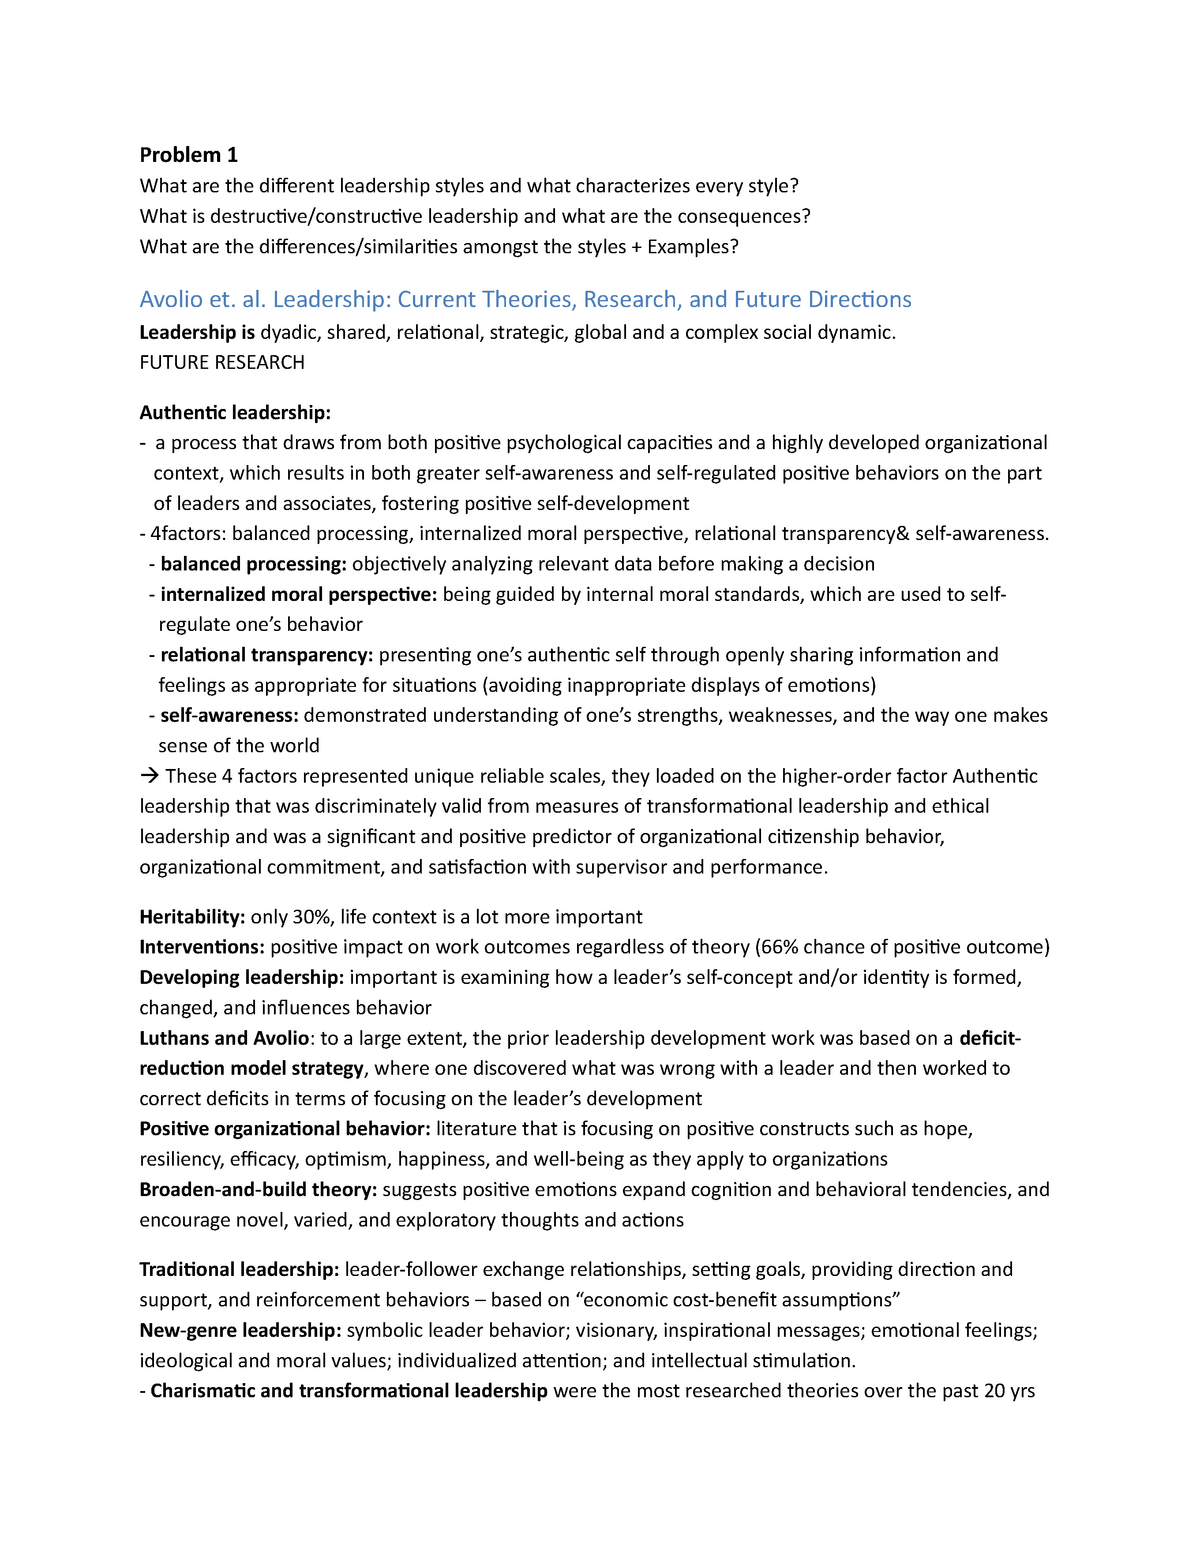 Problem 1 - Leadership & Coaching FSWP3081A - EUR - StudeerSnel